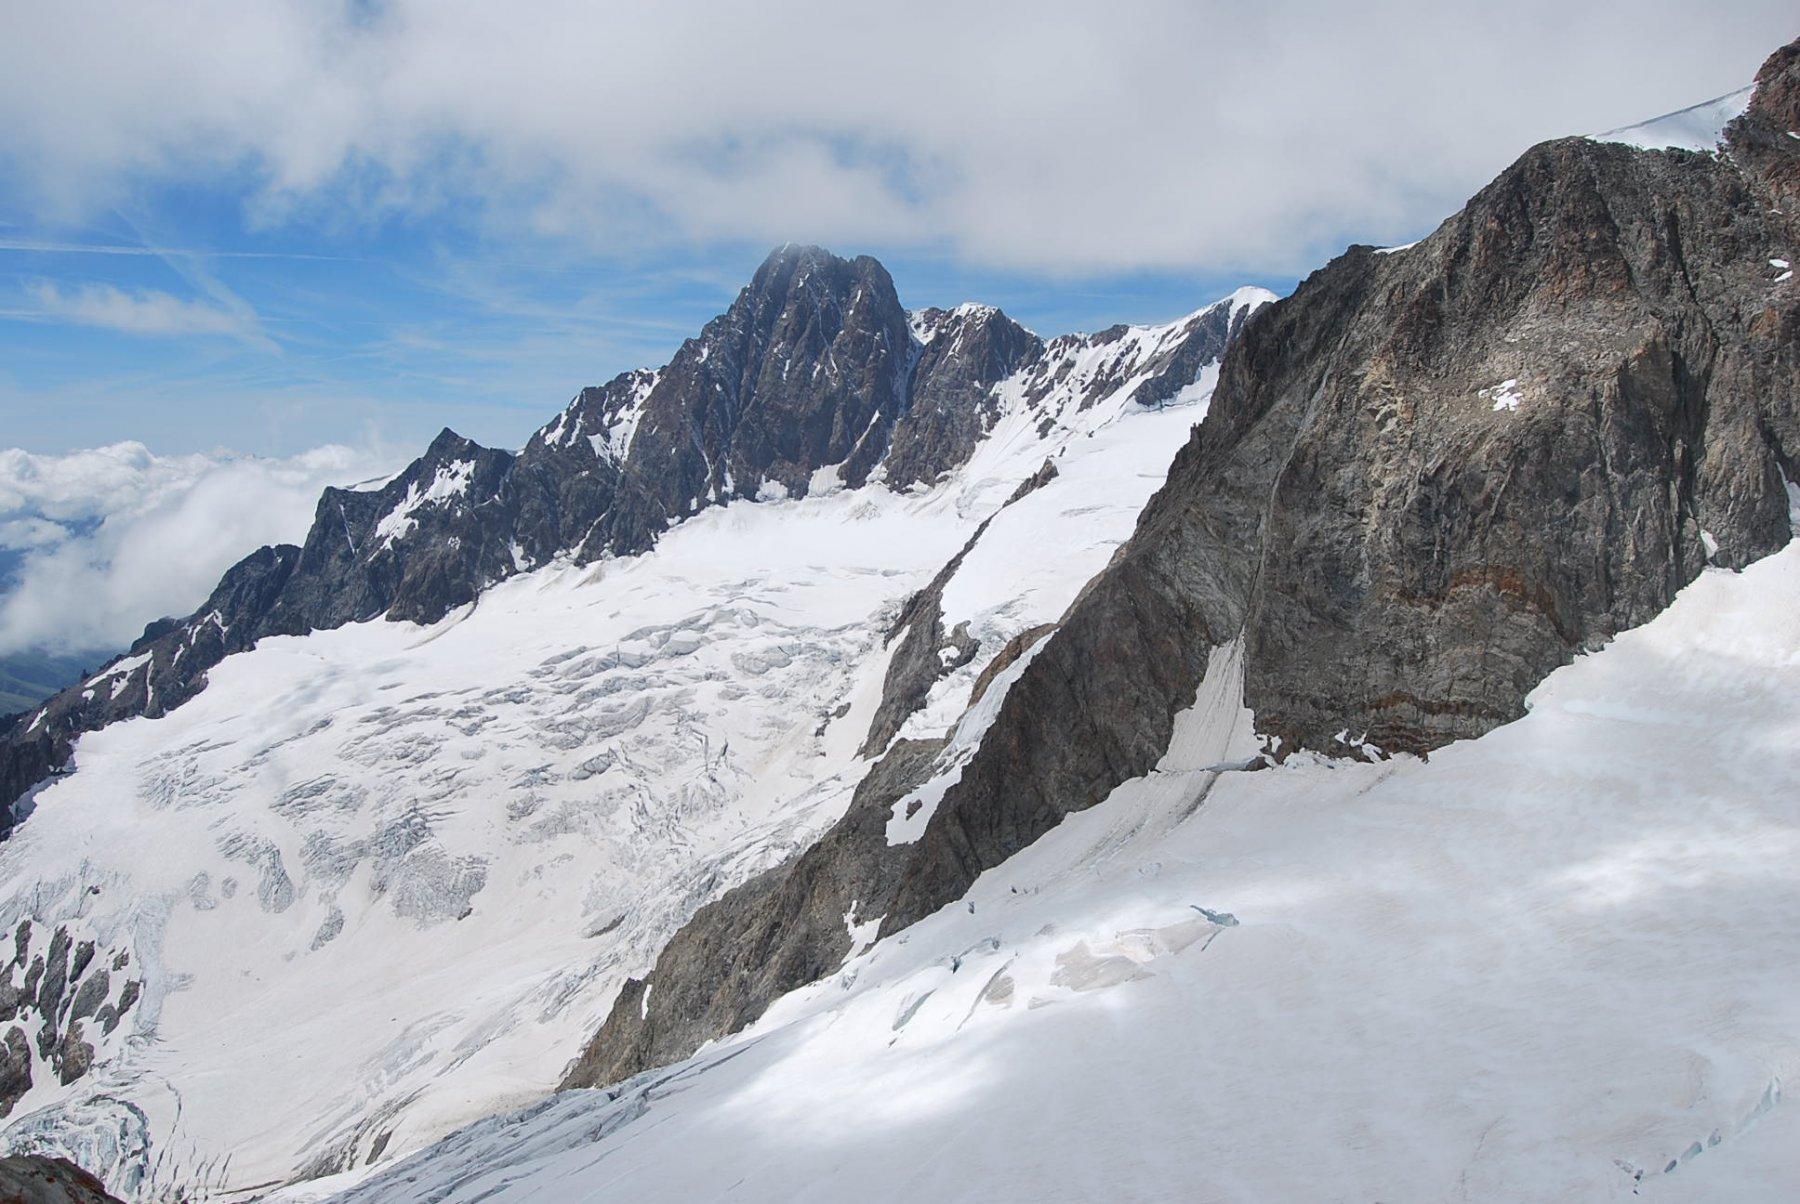 Aig. Glaciers, Aig. e Ghiacciaio Lex Blanche con i crepacci